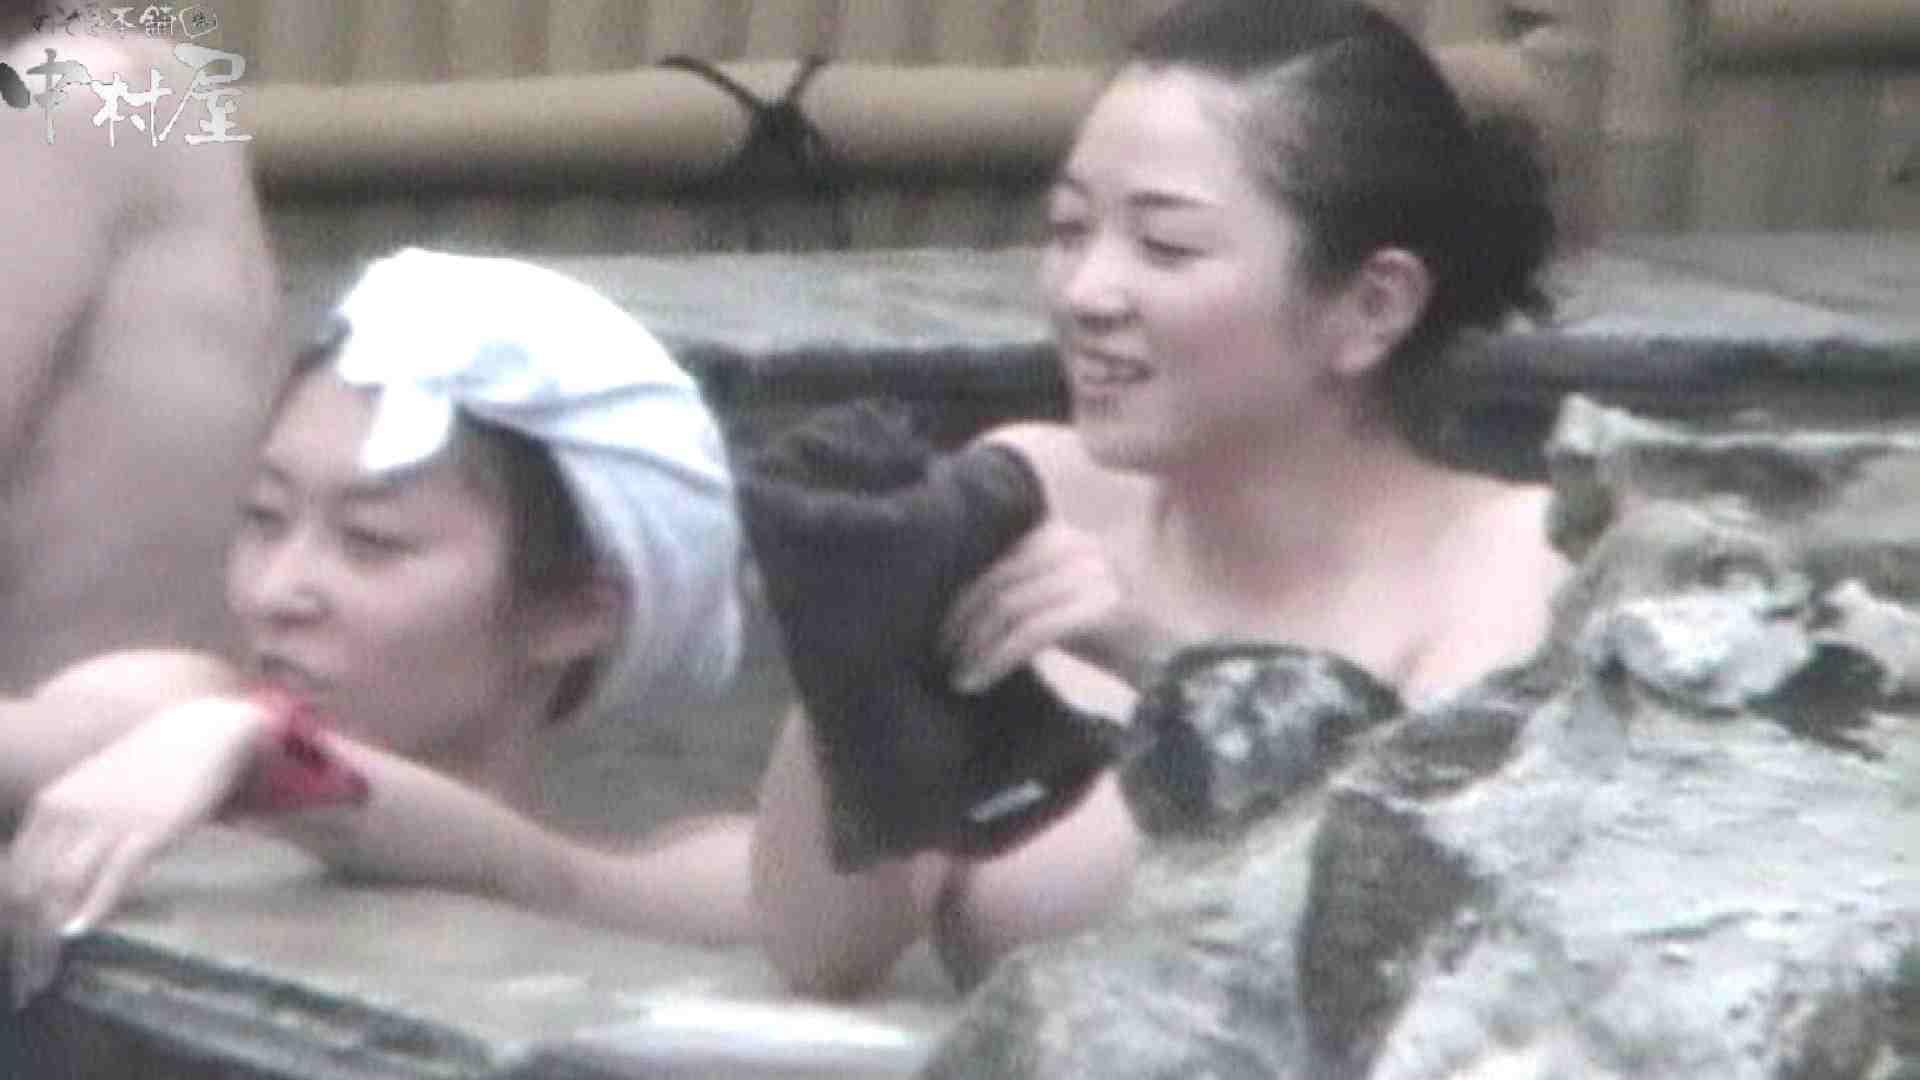 Aquaな露天風呂Vol.554 盗撮 濡れ場動画紹介 24連発 11